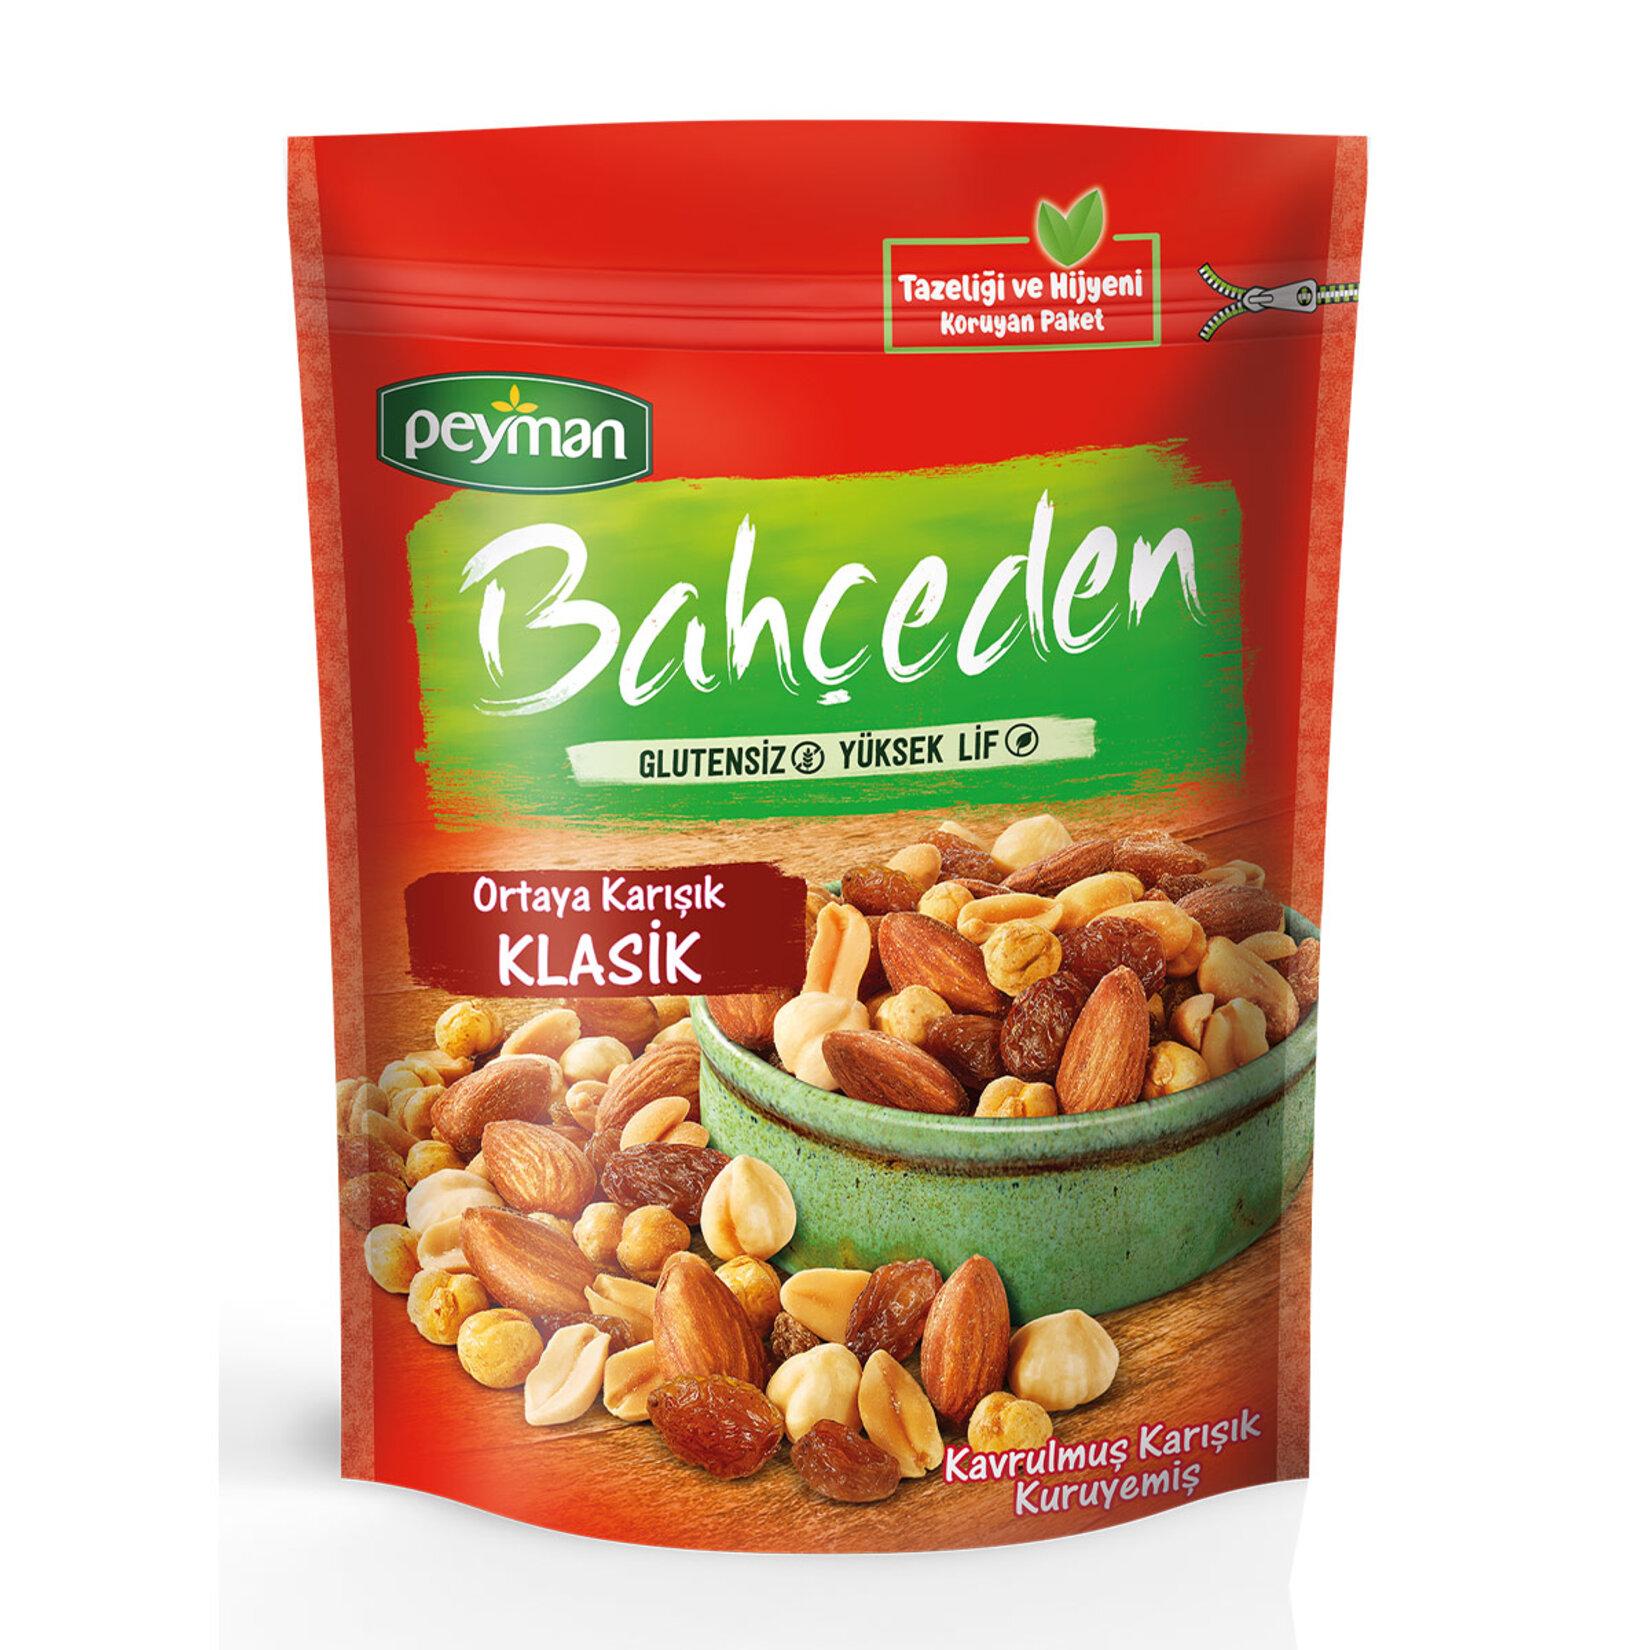 Peyman Bahceden Roasted Raw Mix Gluten Free 120 gr